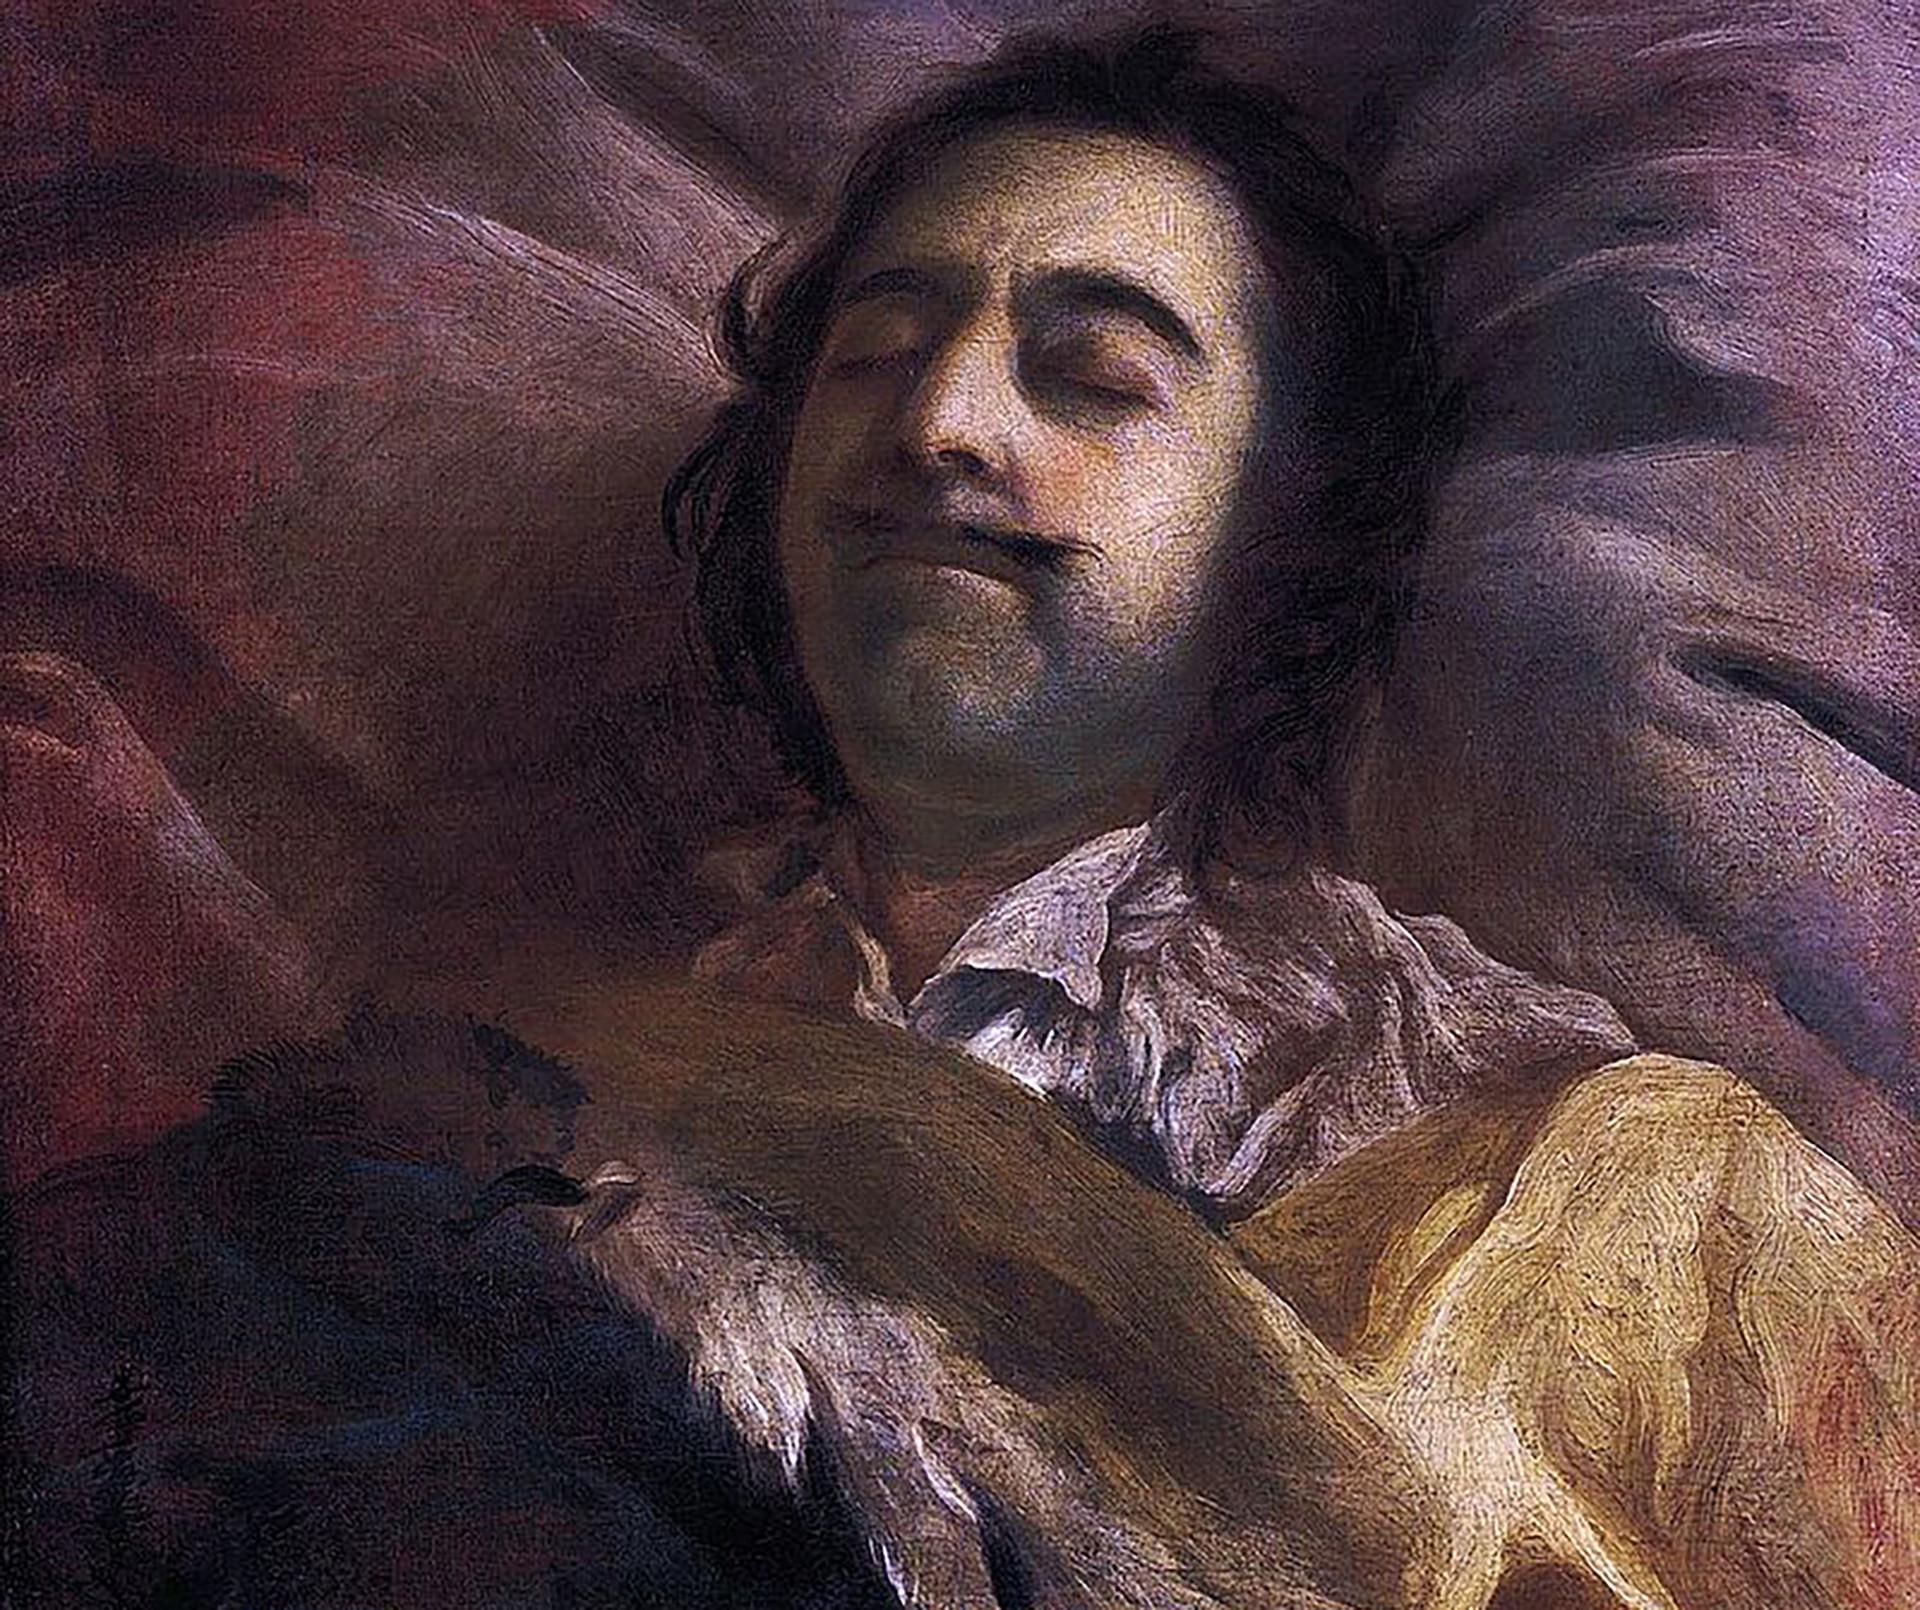 Pyotr I di ranjang kematian. Lukisan karya Ivan Nikitin.